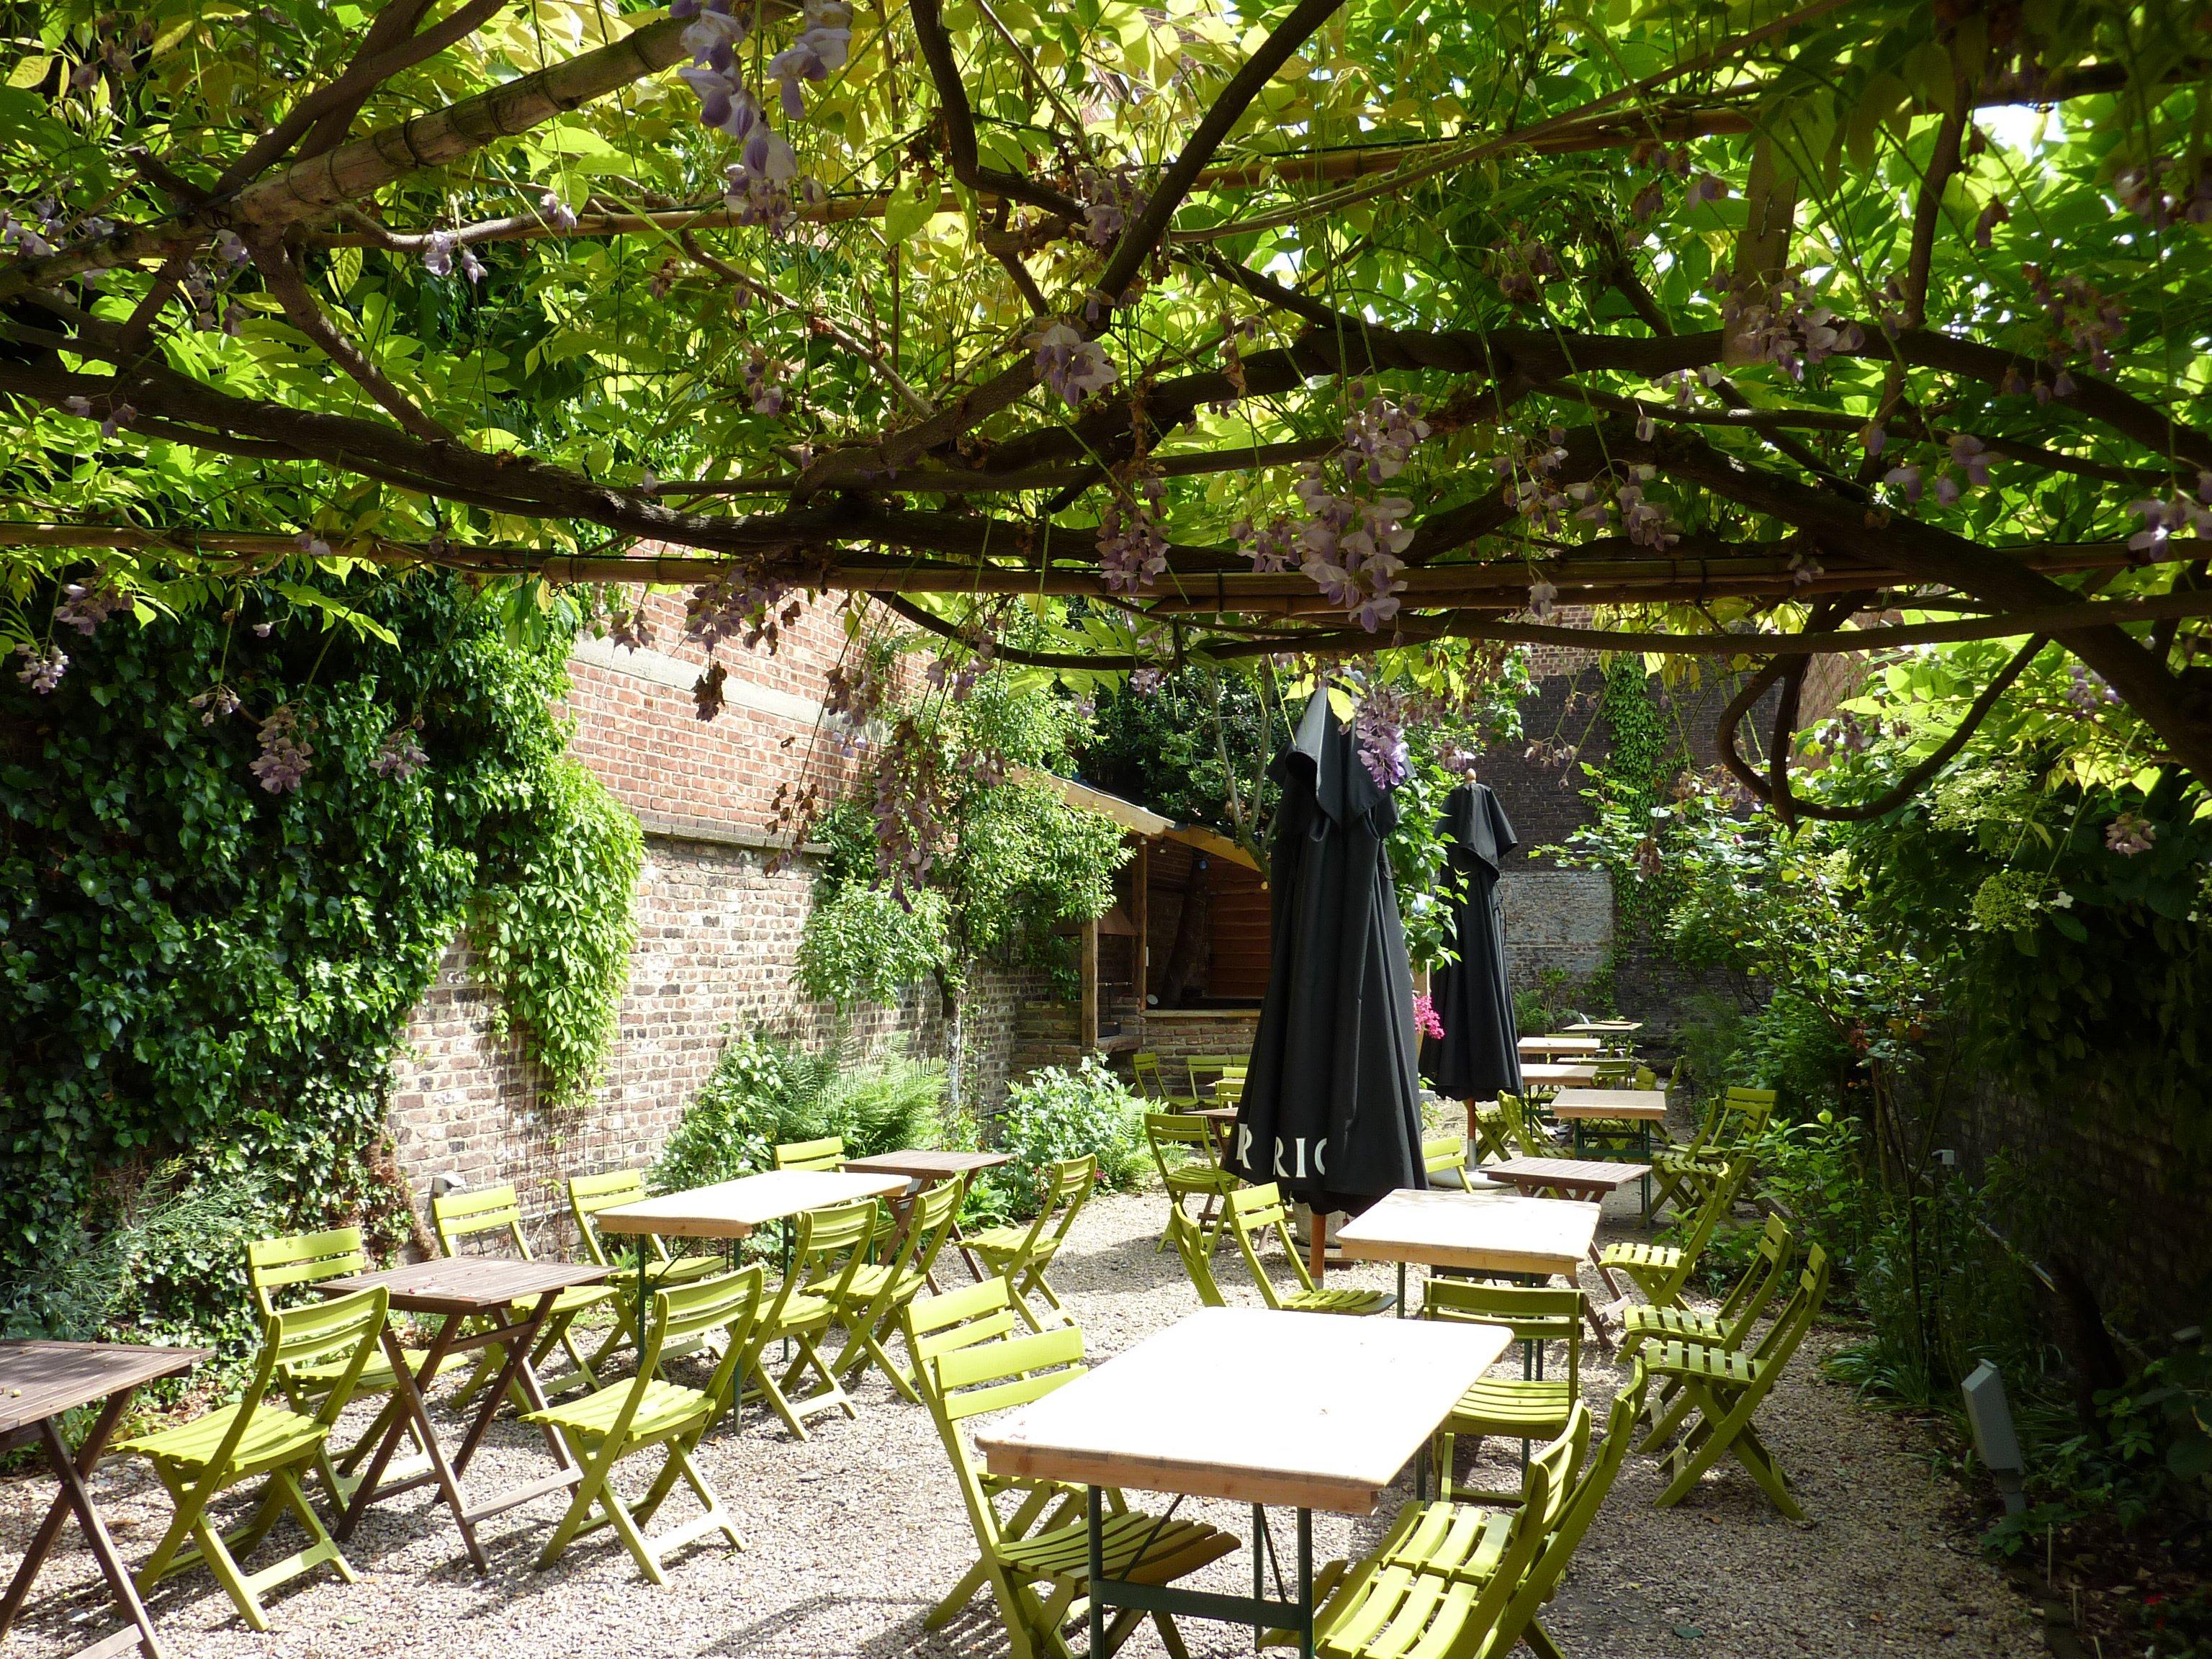 Cote cour cote jardin brasserie restaurant liege 4020 for Le jardin de caroline restaurant